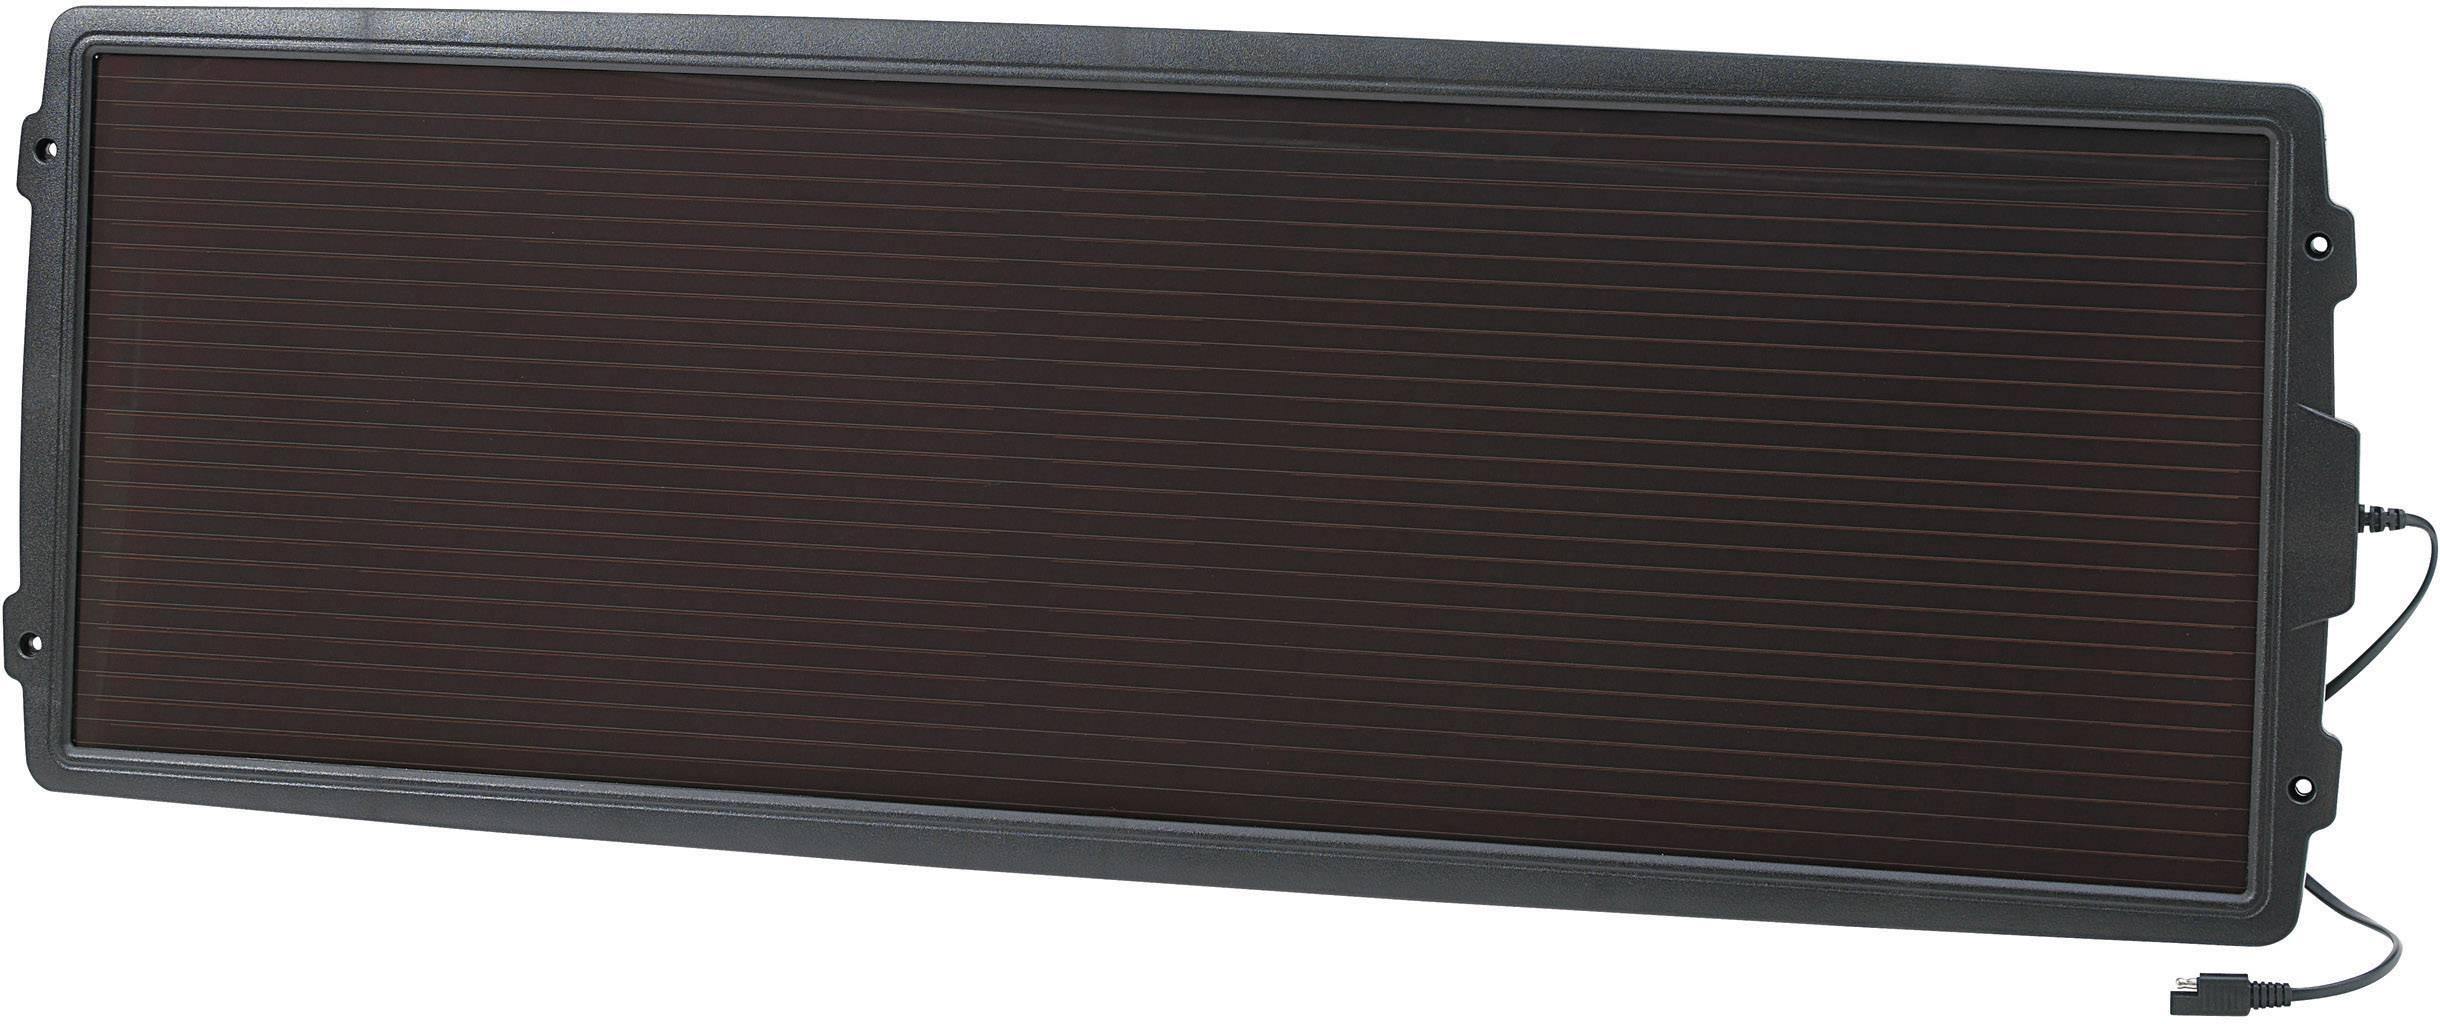 Solárna nabíjačka autobatérií TPS-102-15, 15 W